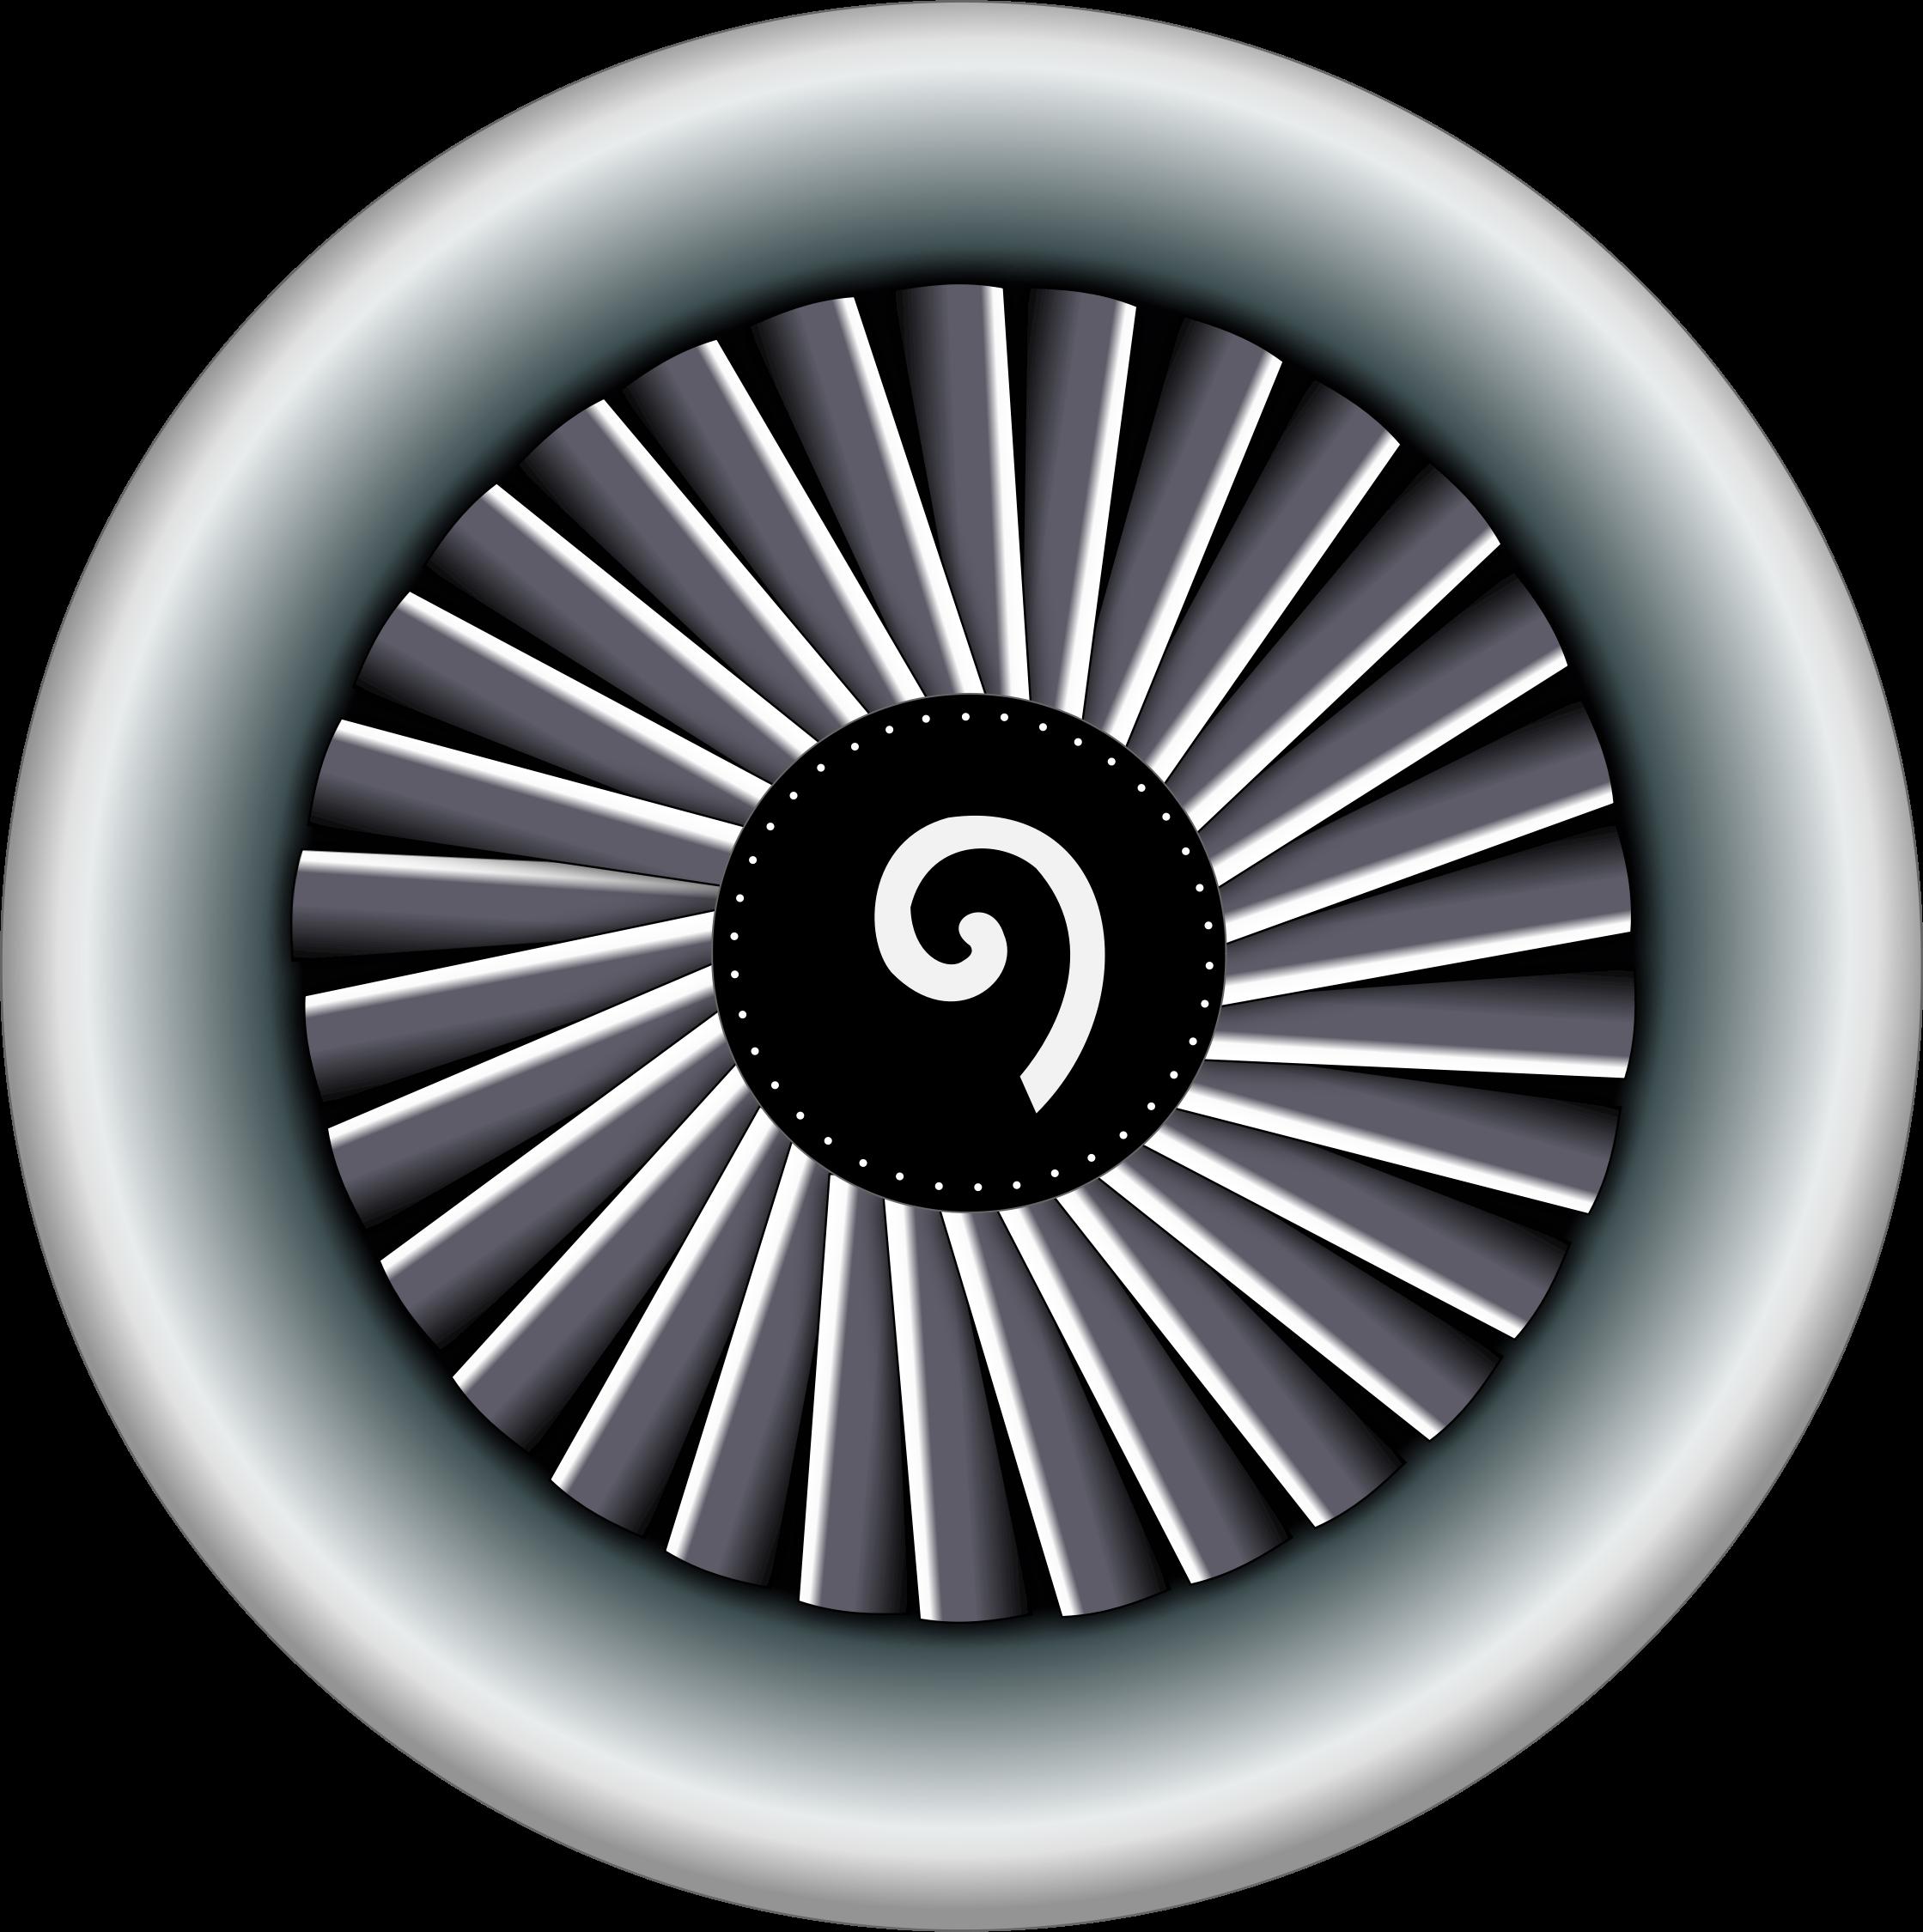 Jet clipart jet engine Engine Engine Jet Clipart Jet